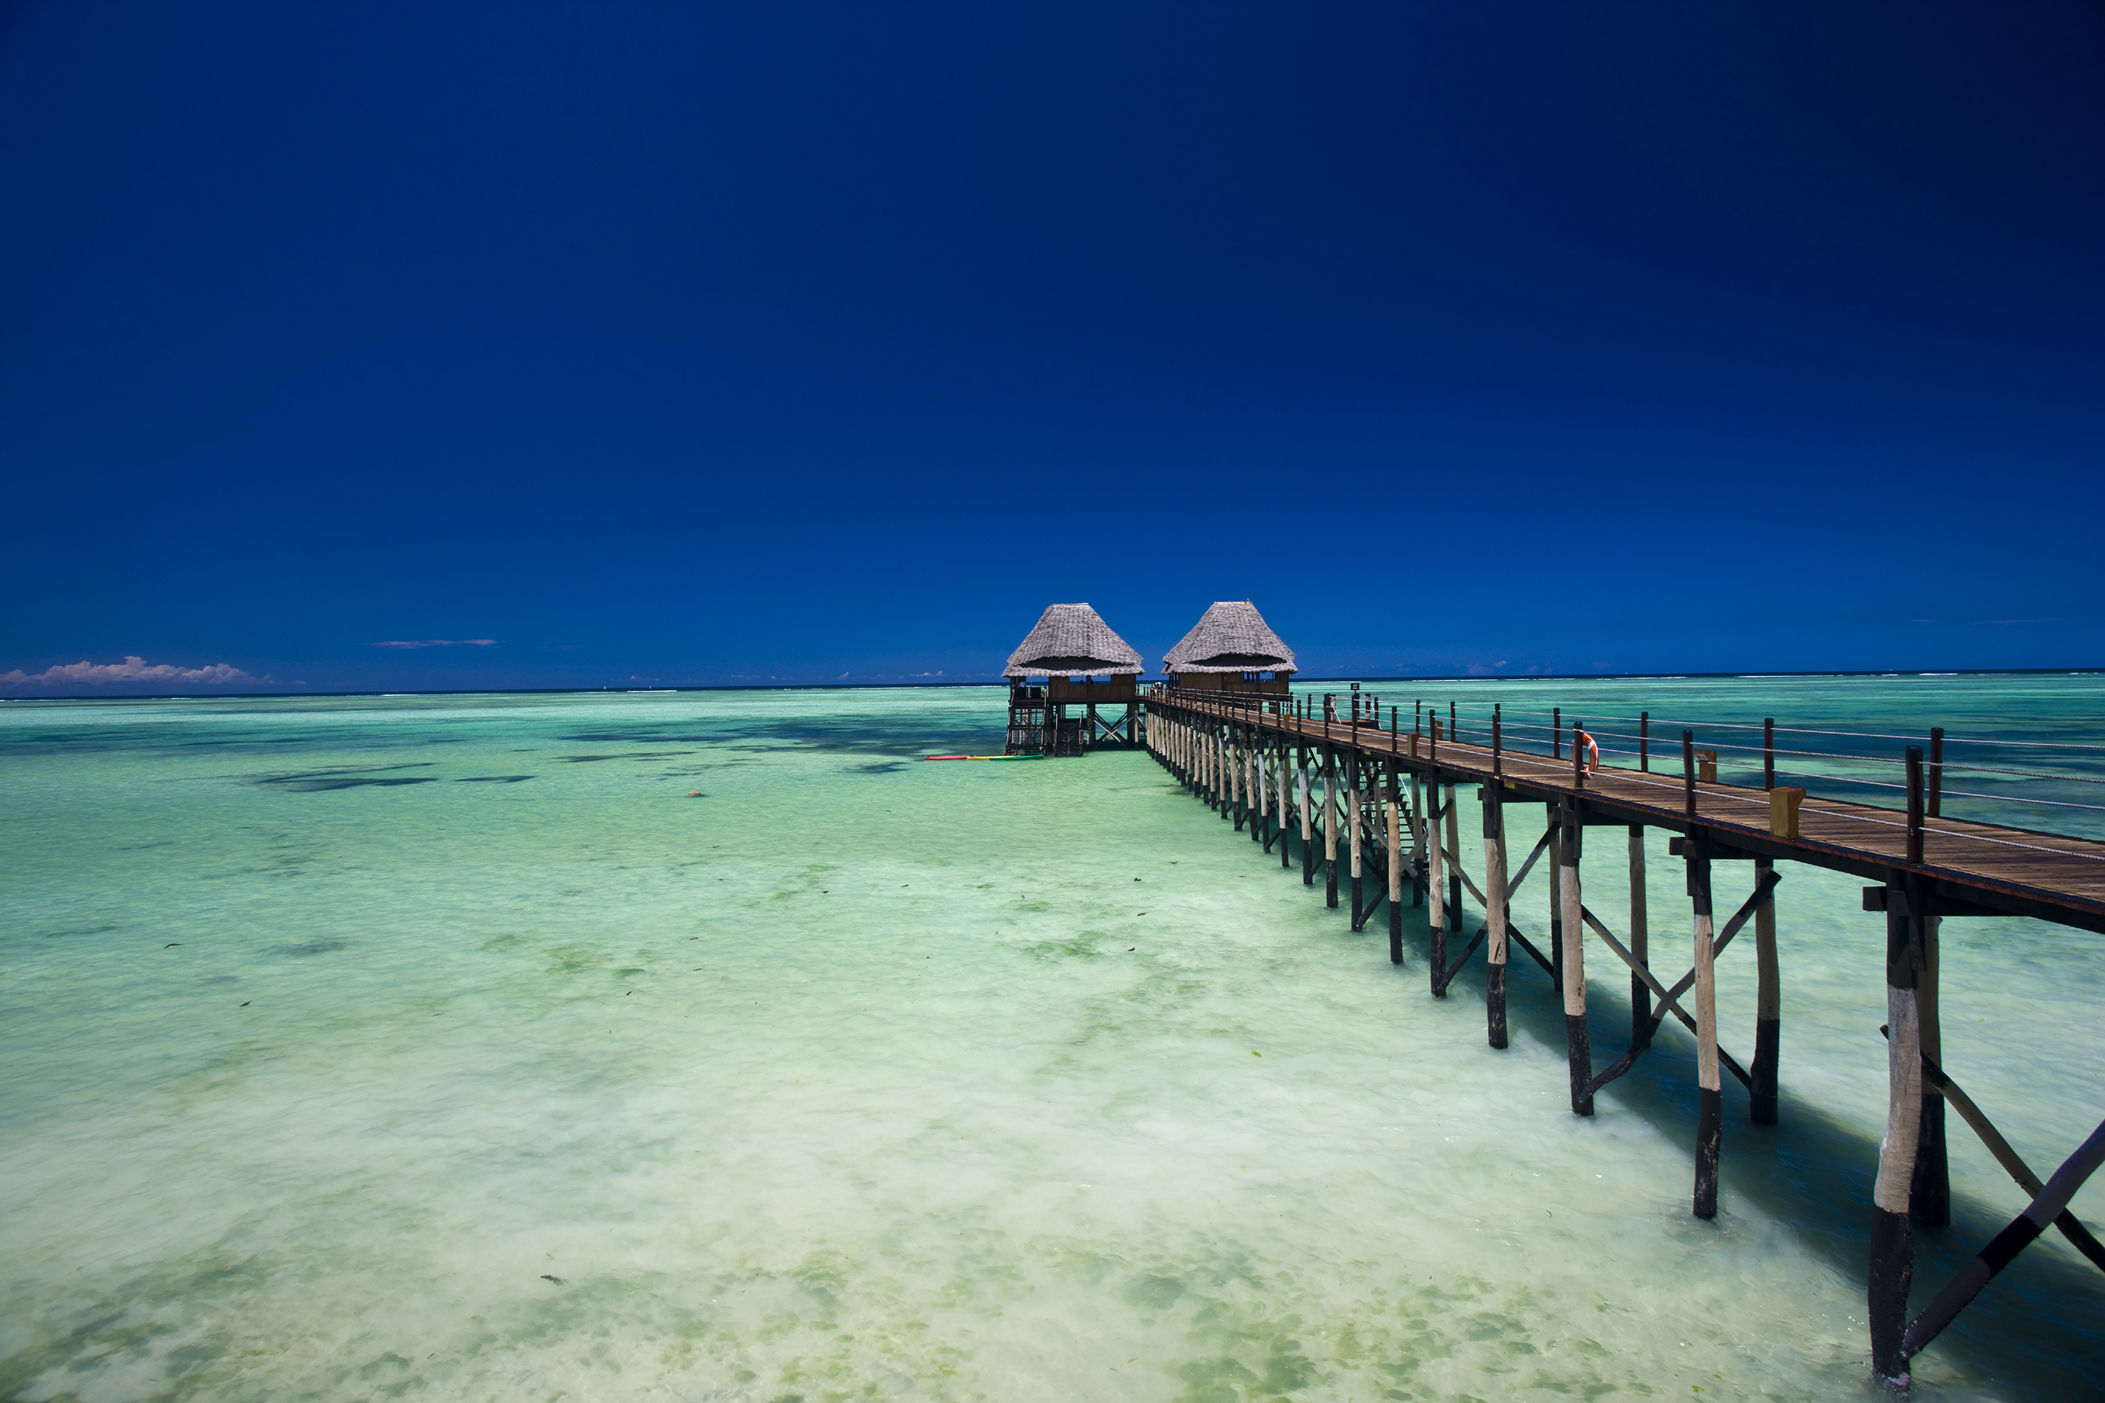 Jetty on Spice Island Zanzibar Tanzania